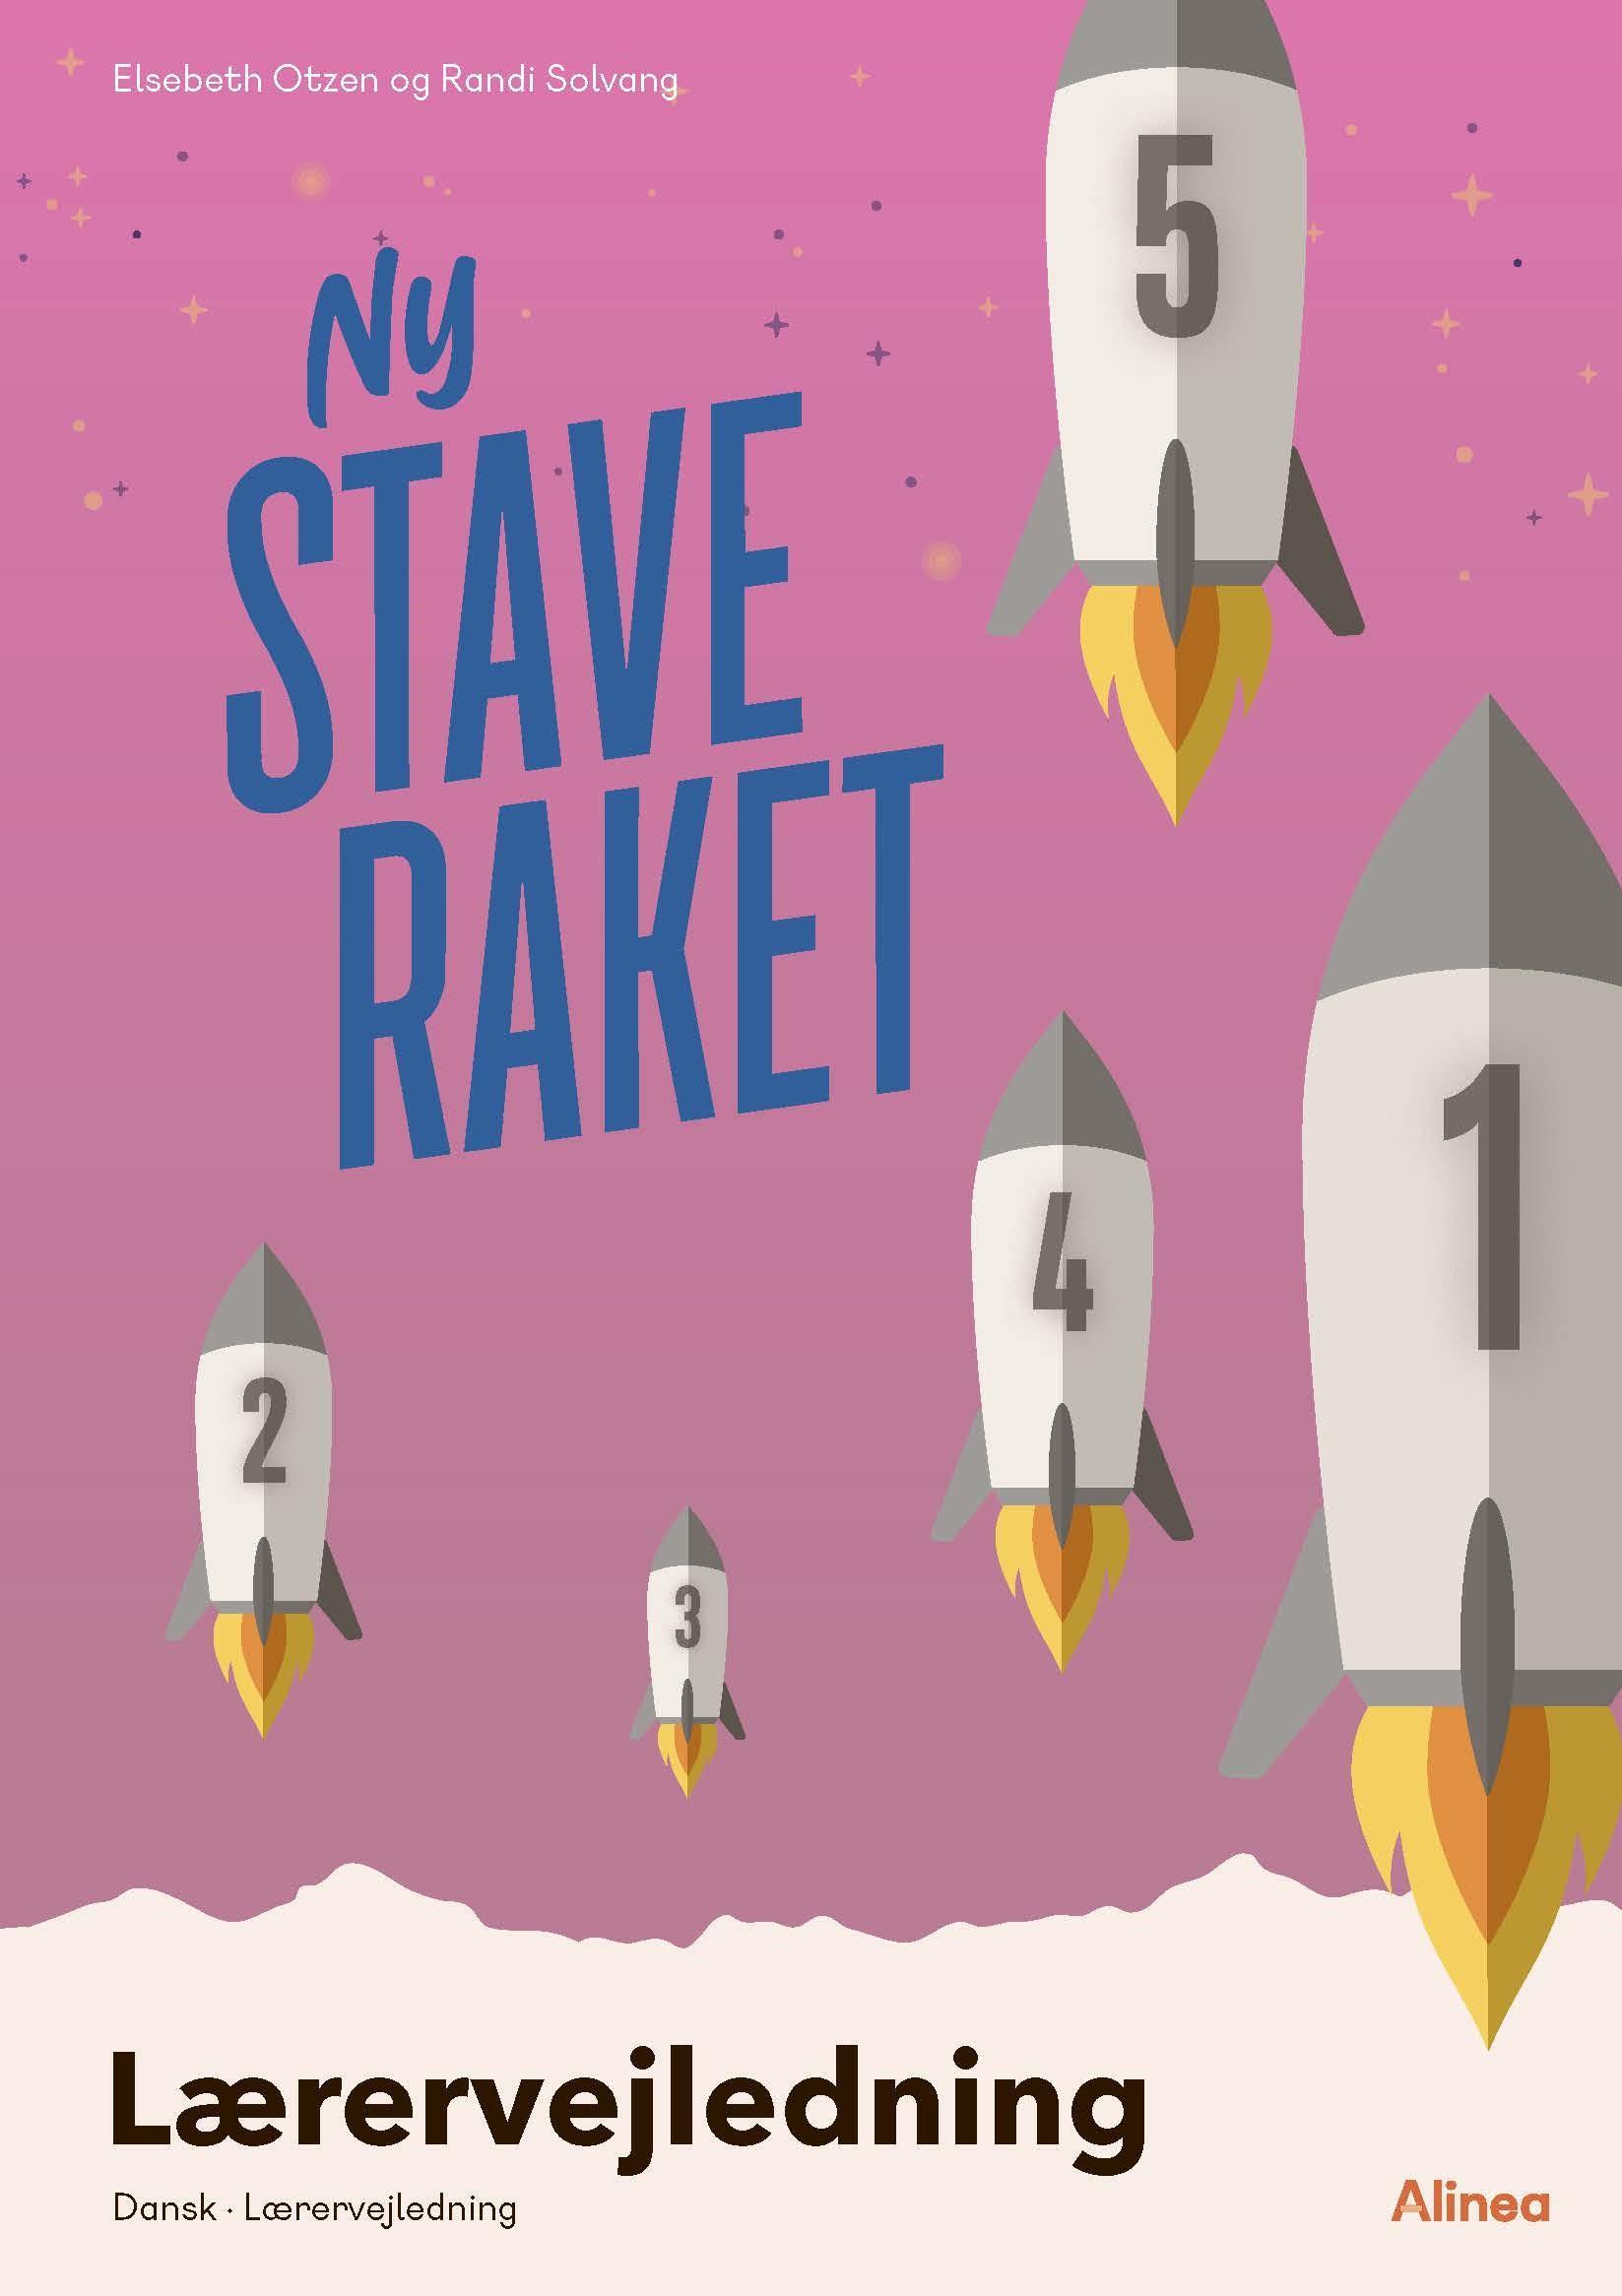 Ny Staveraket: Ny Staveraket, lærervejledning - Elsebeth Otzen; Randi Solvang - Bøger - Alinea - 9788723540560 - August 15, 2021